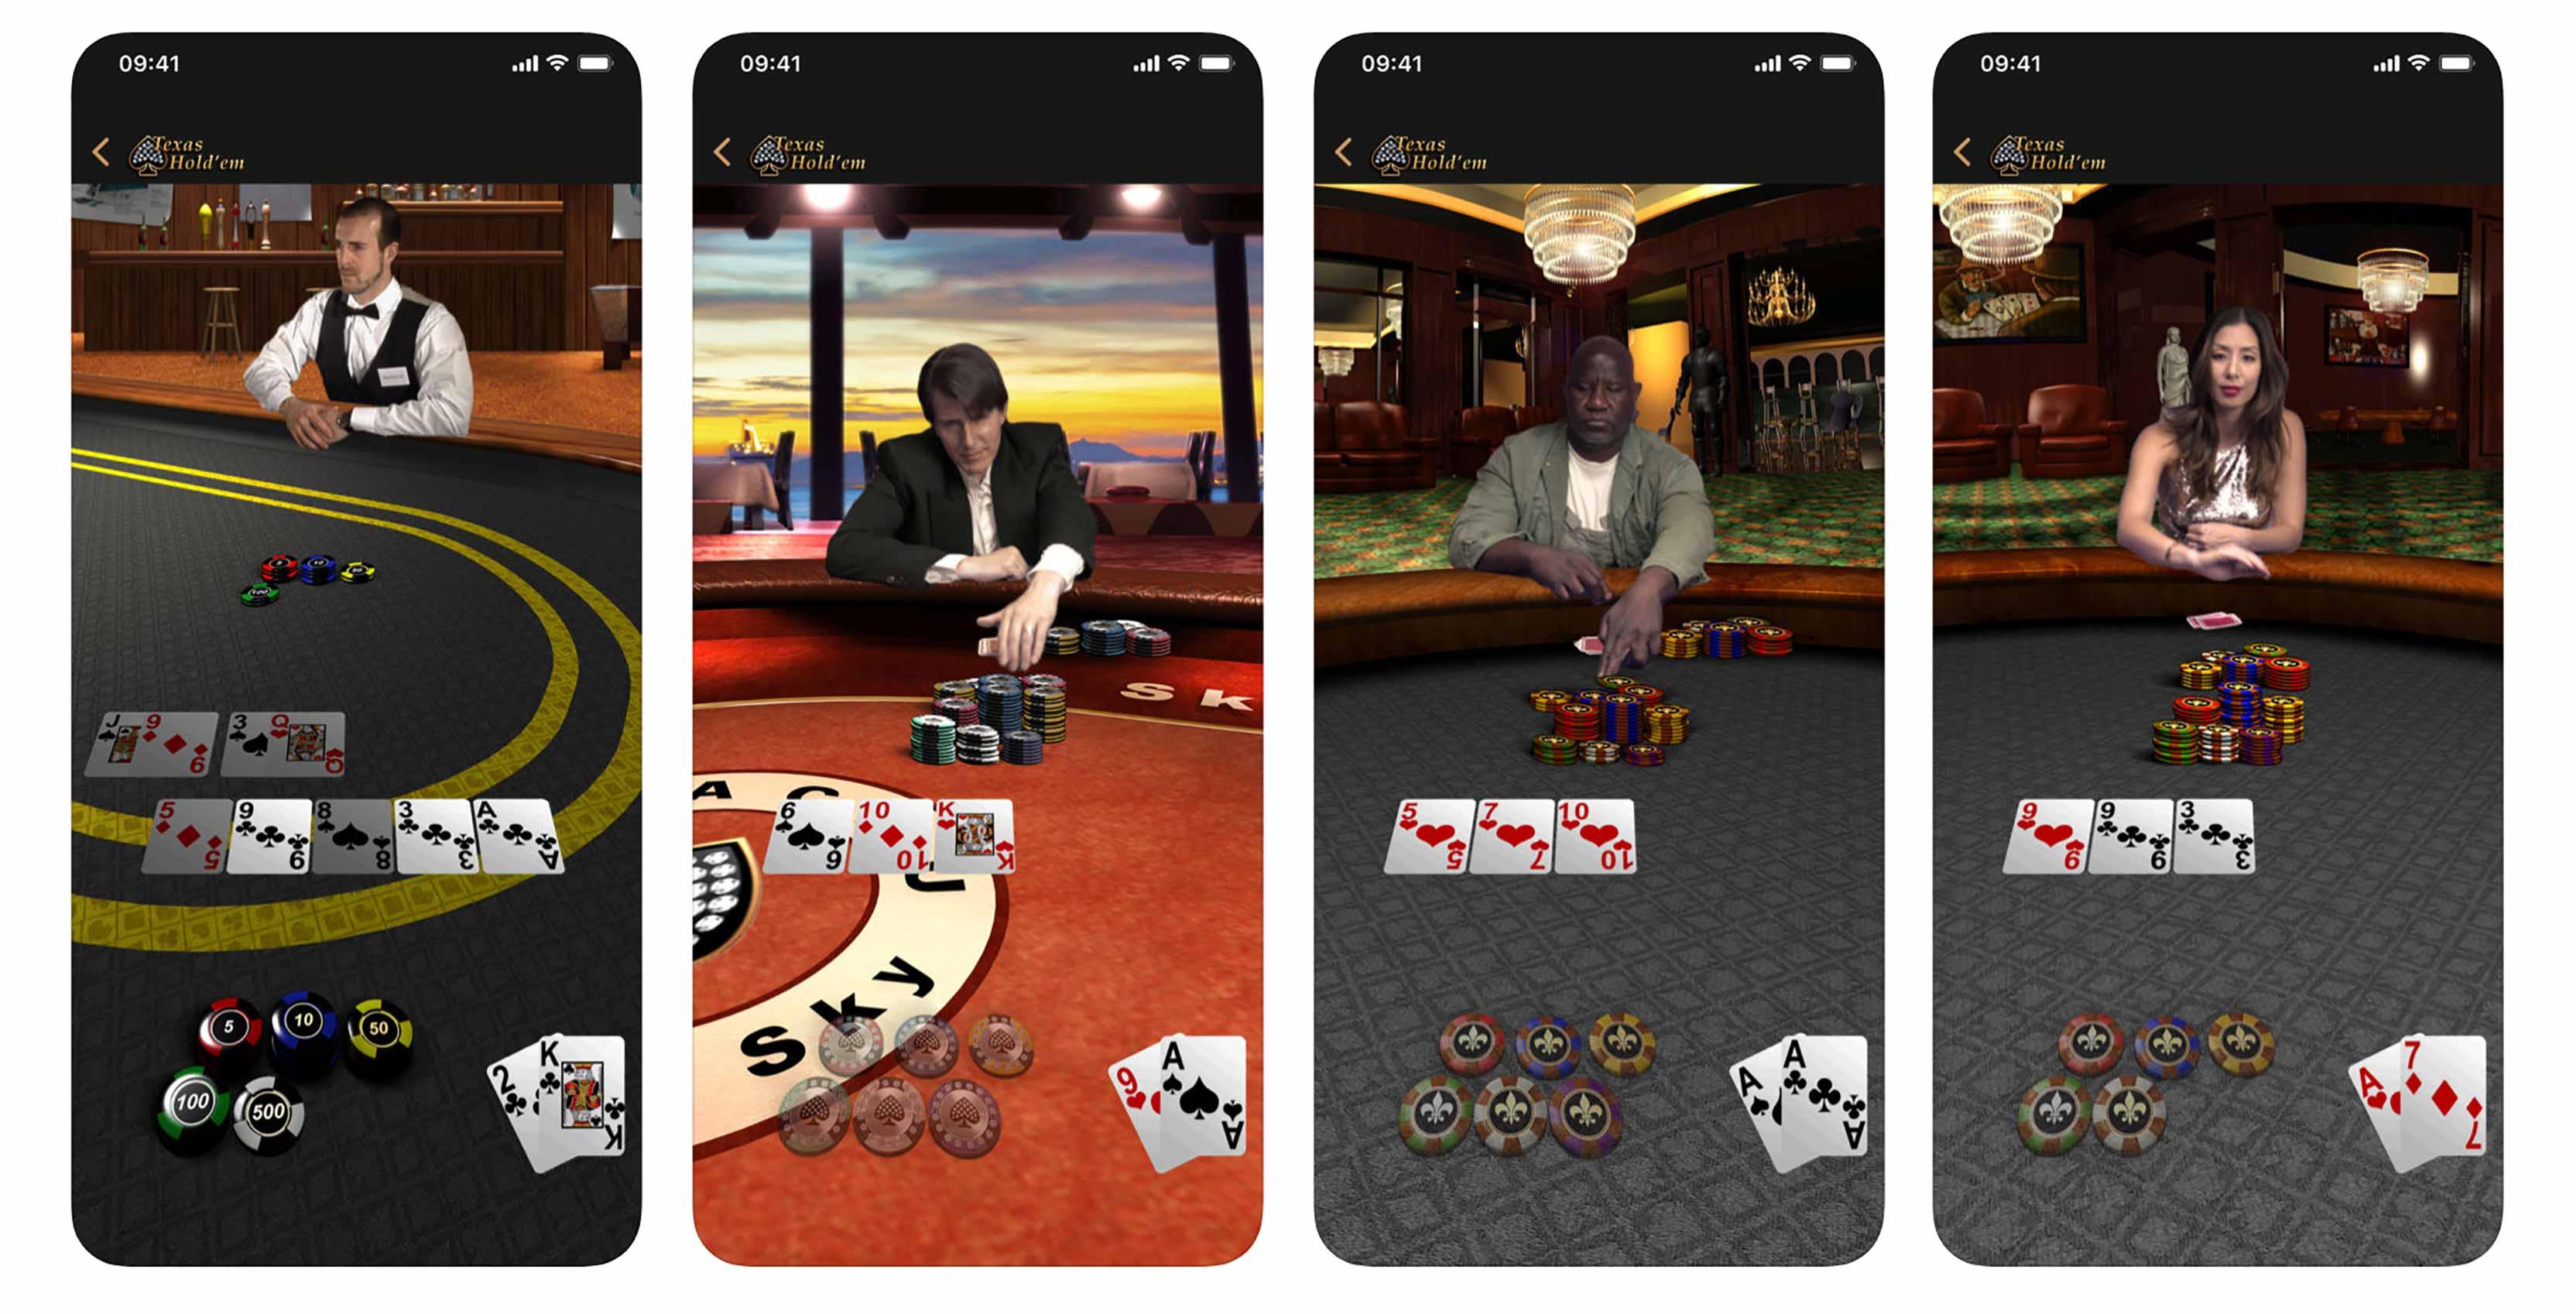 Apple Texas Hold'em